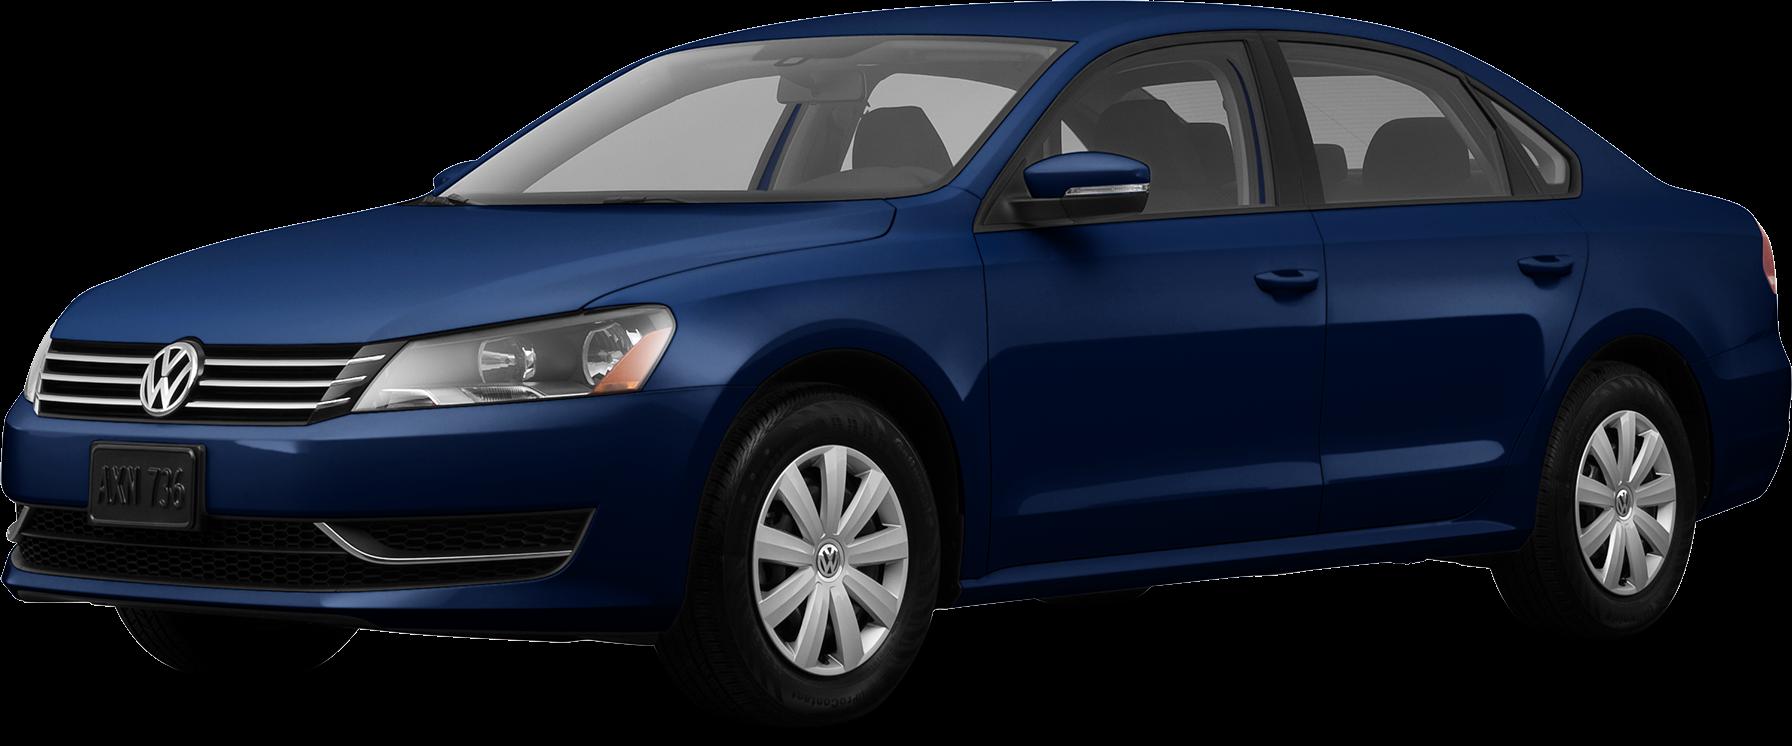 2013 Volkswagen Jetta | Pricing, Ratings, Expert Review